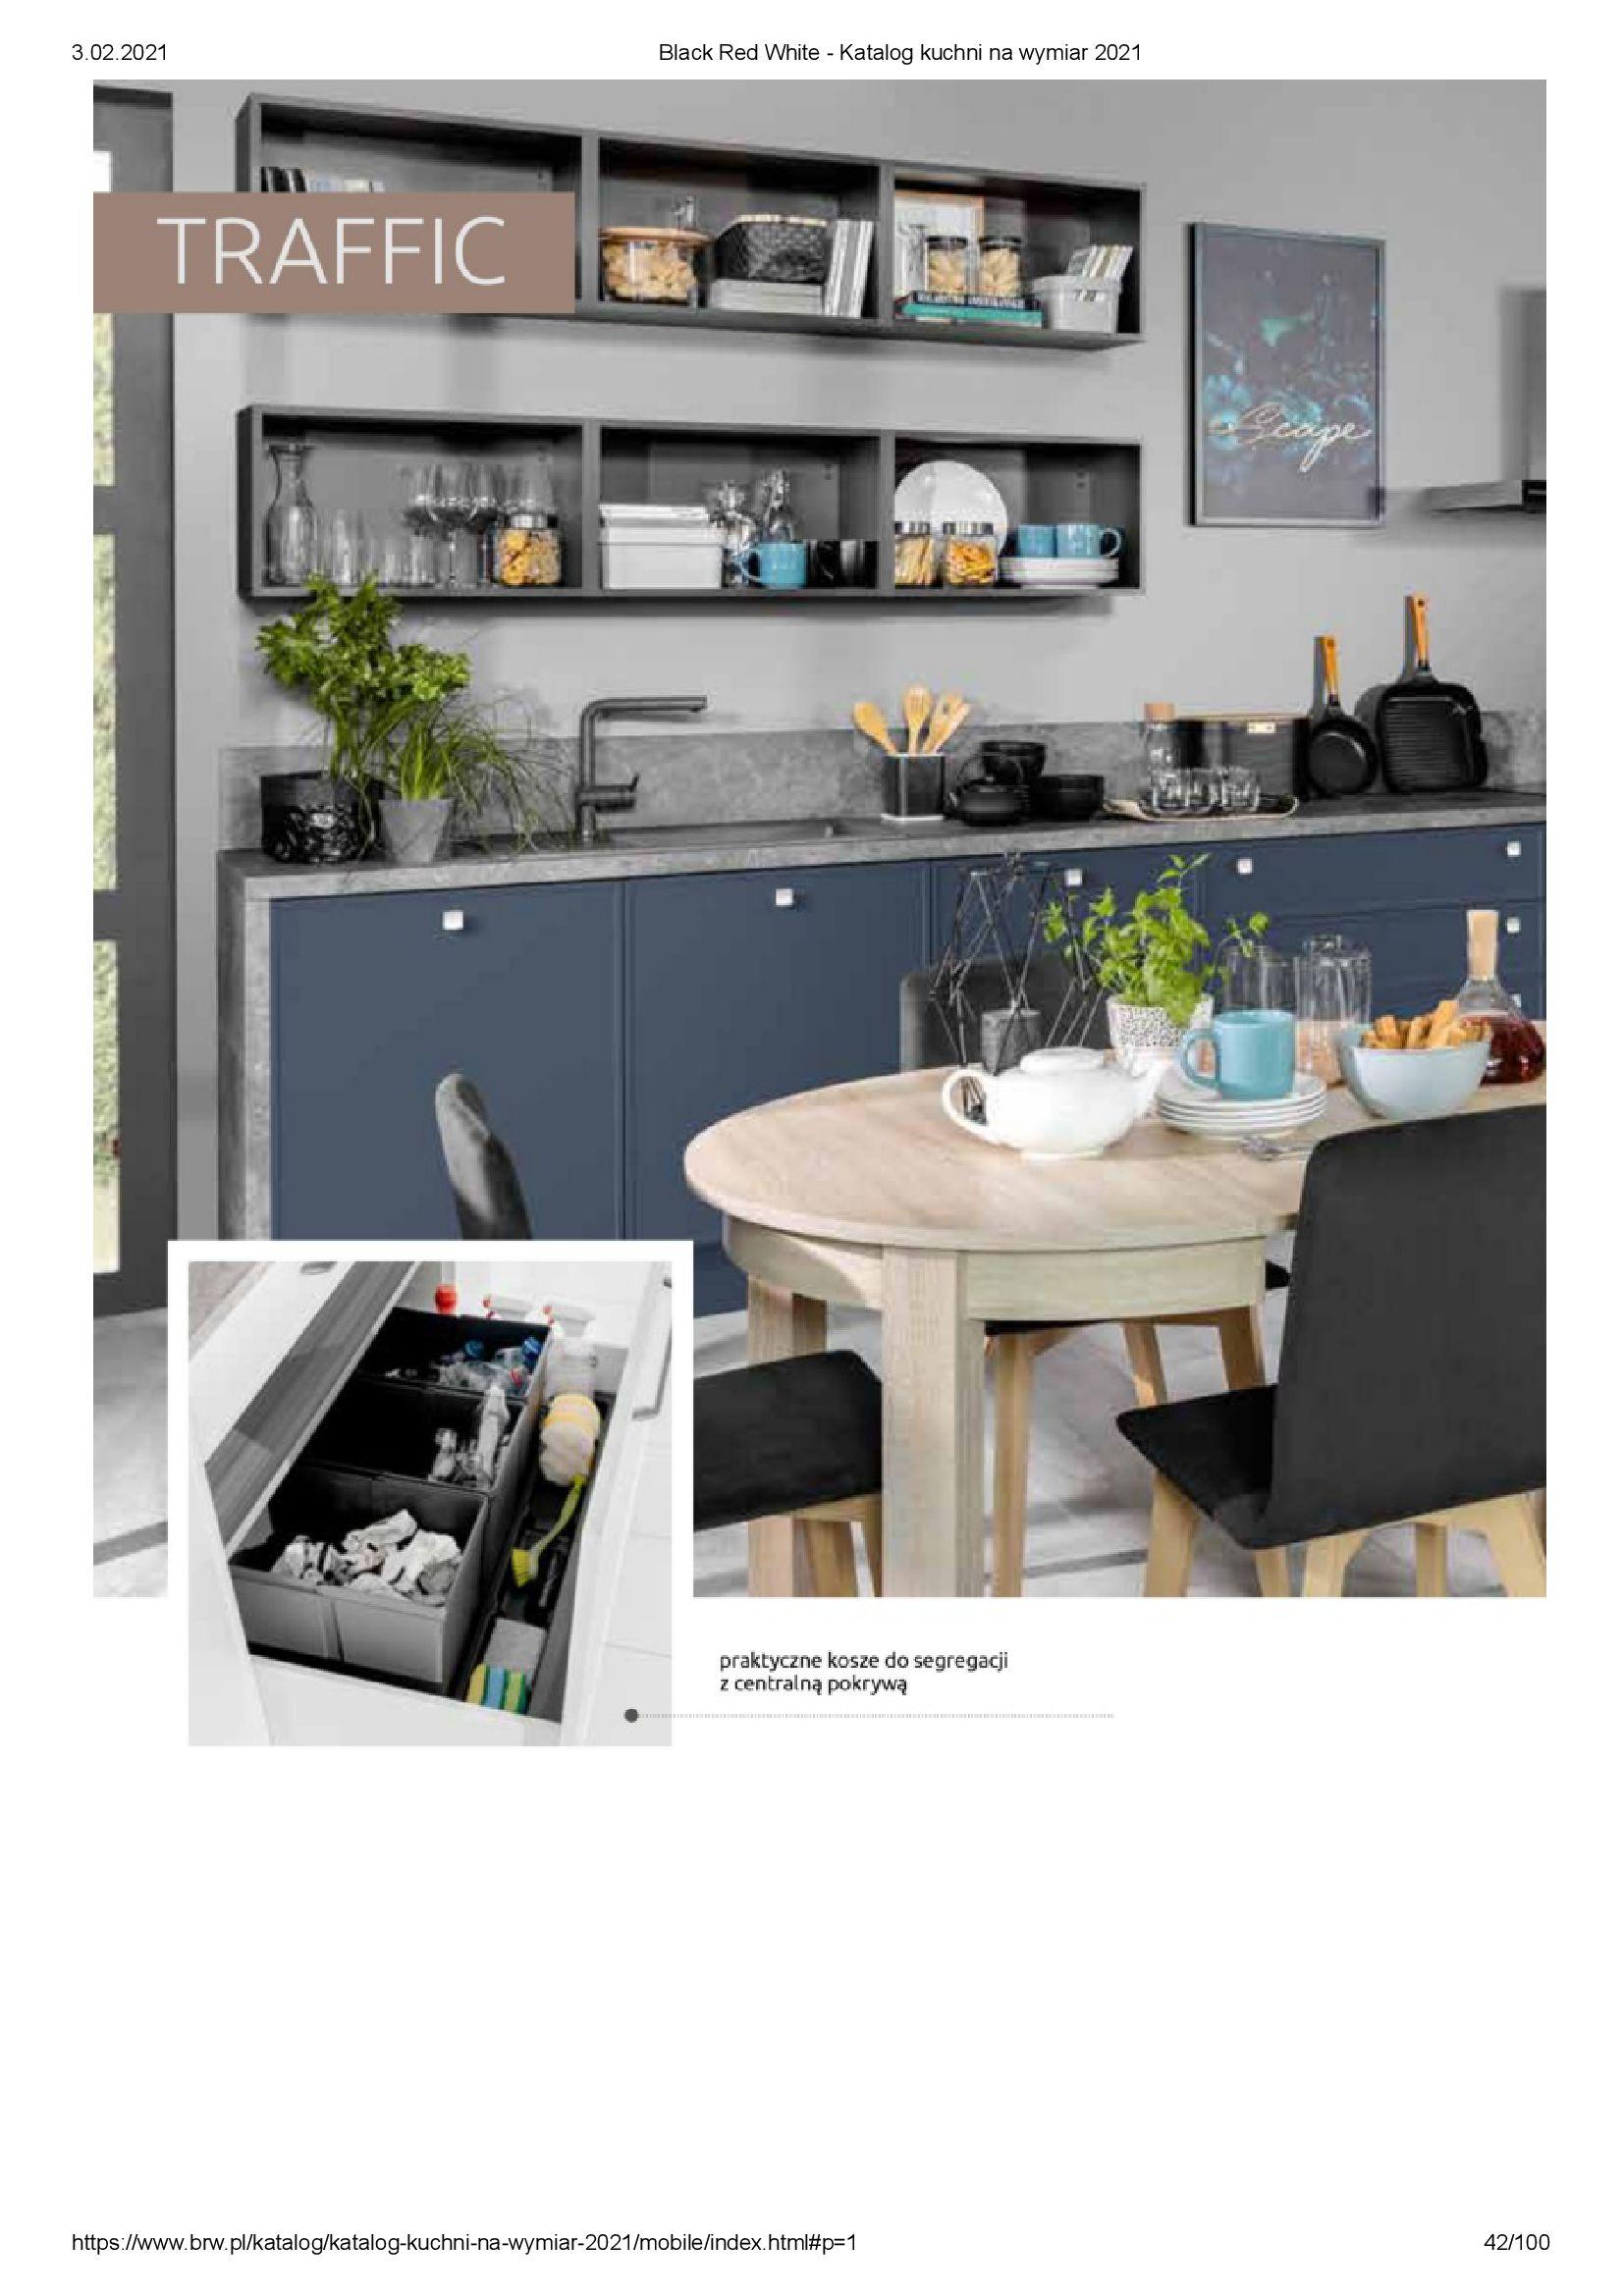 Gazetka Black Red White: Katalog - Kuchnie na wymiar Senso Kitchens 2021 2021-01-01 page-42